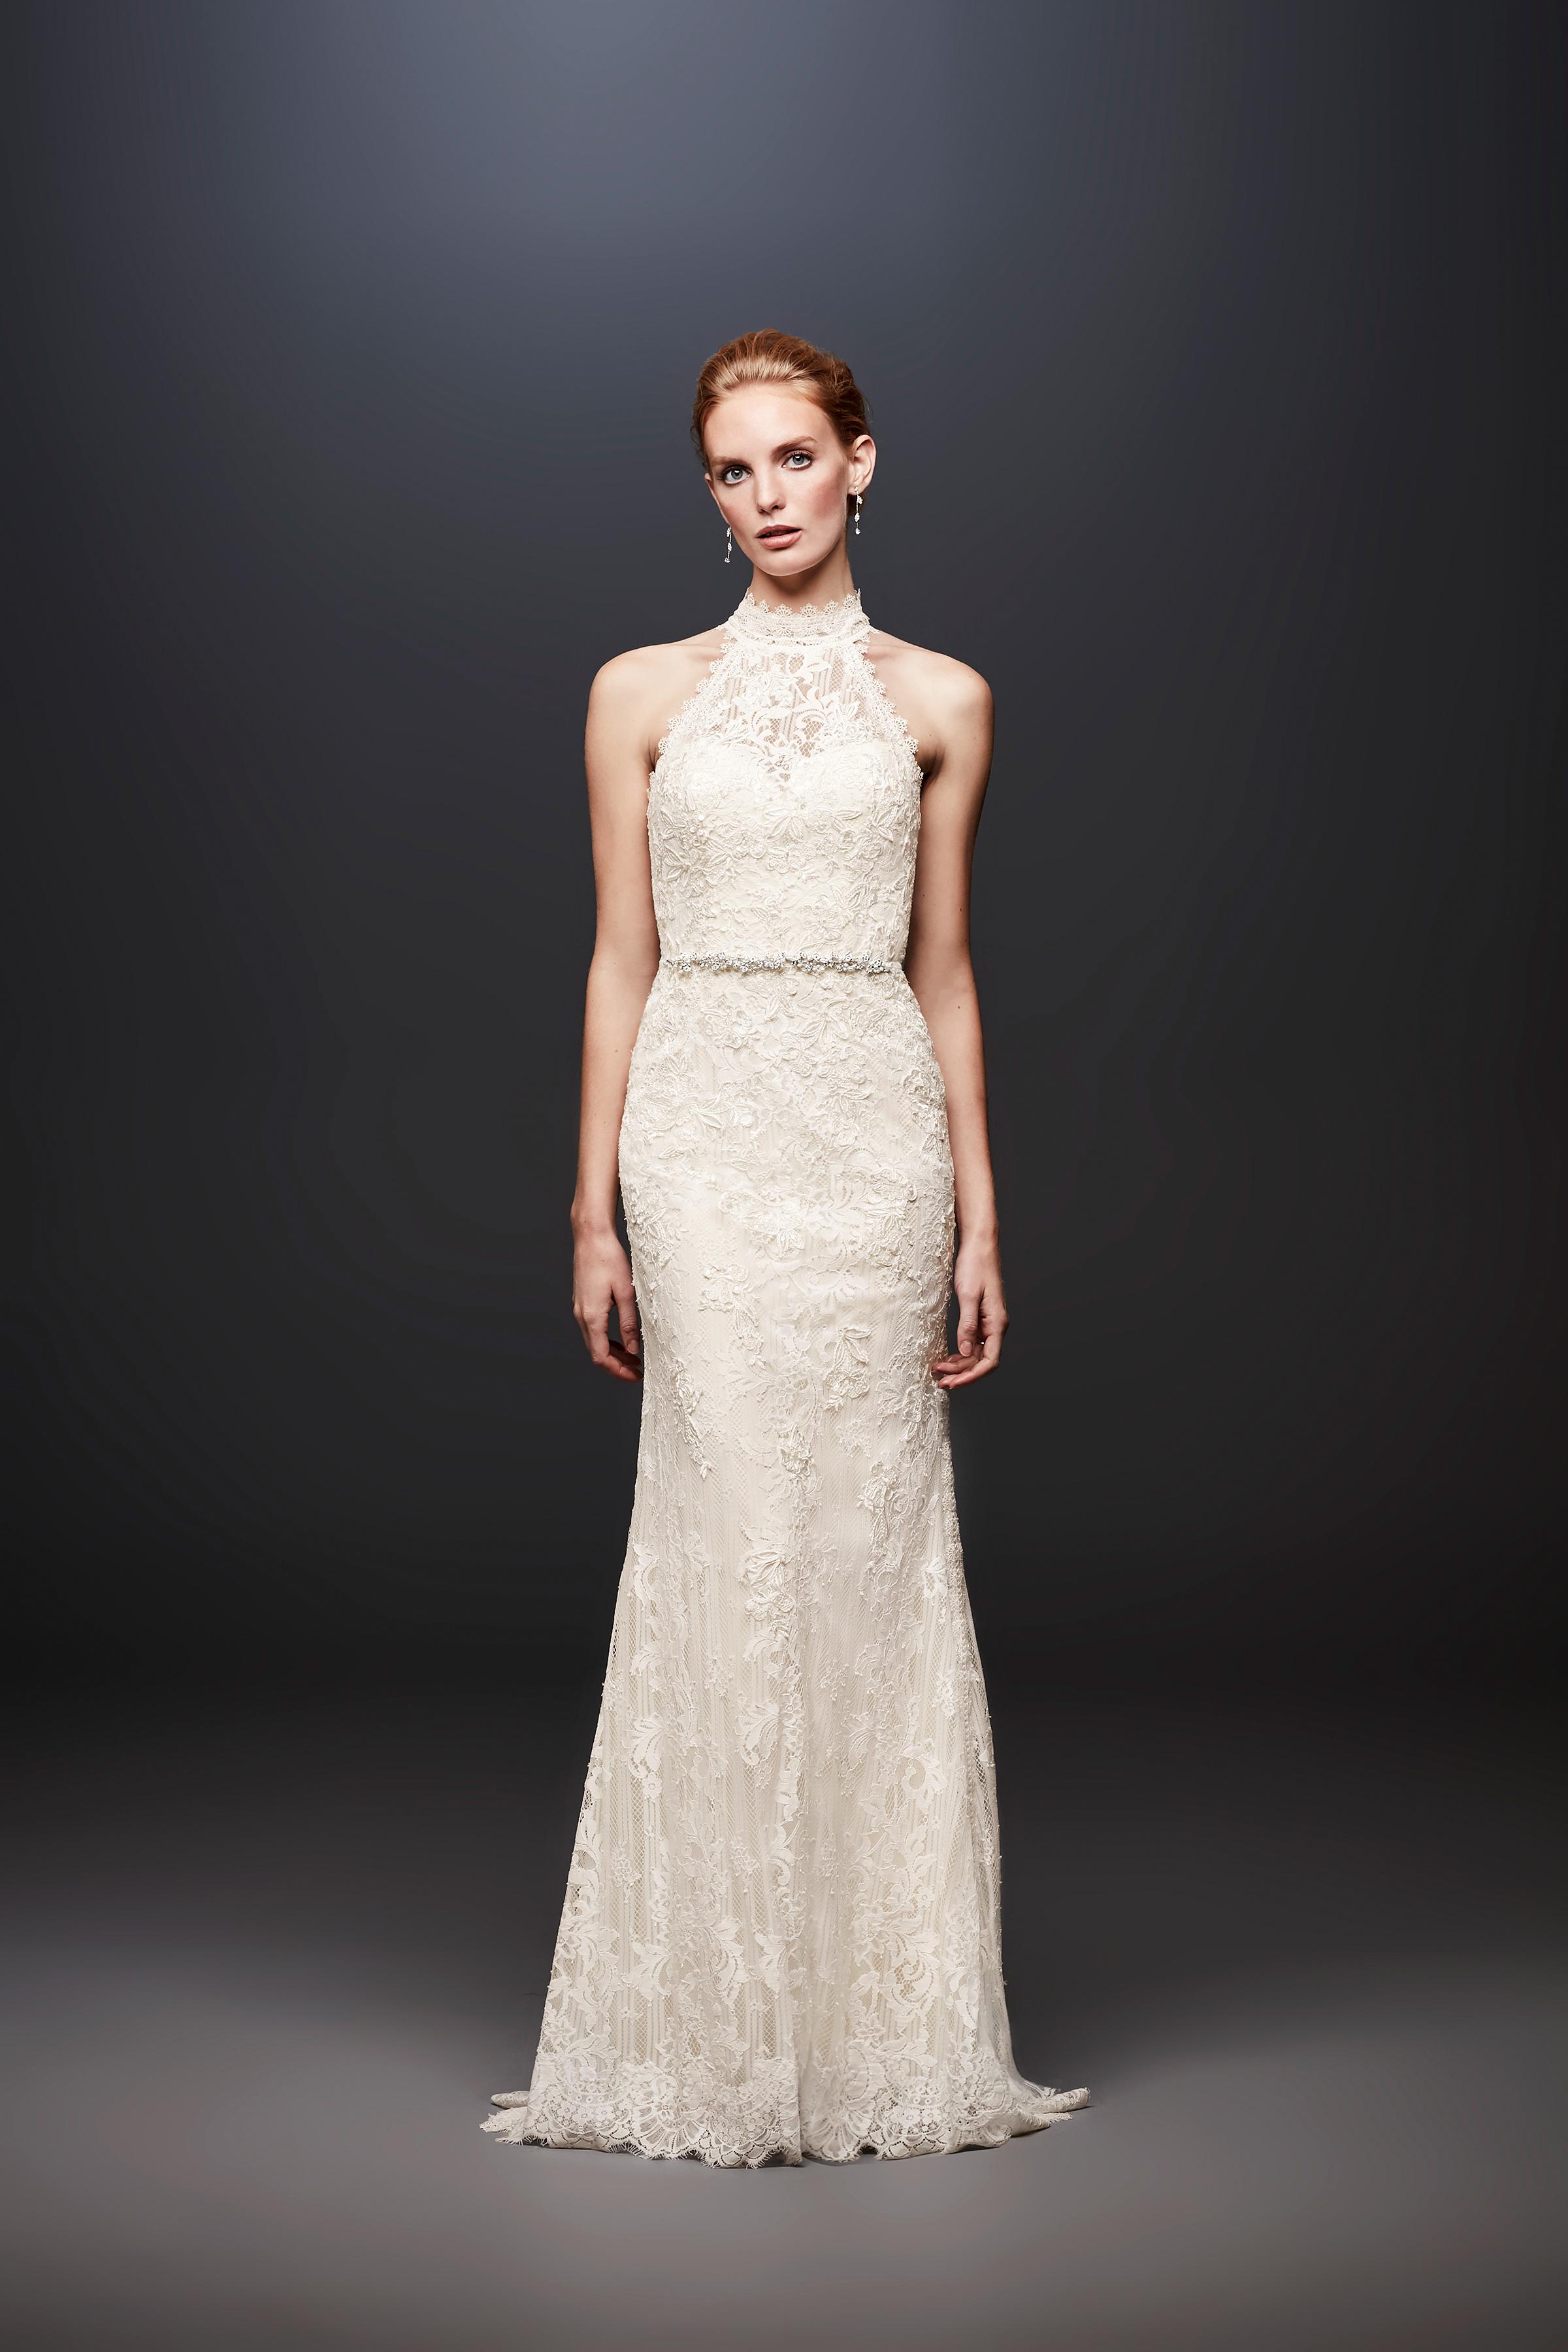 david bridal wedding dress spring 2019 halter lace belt